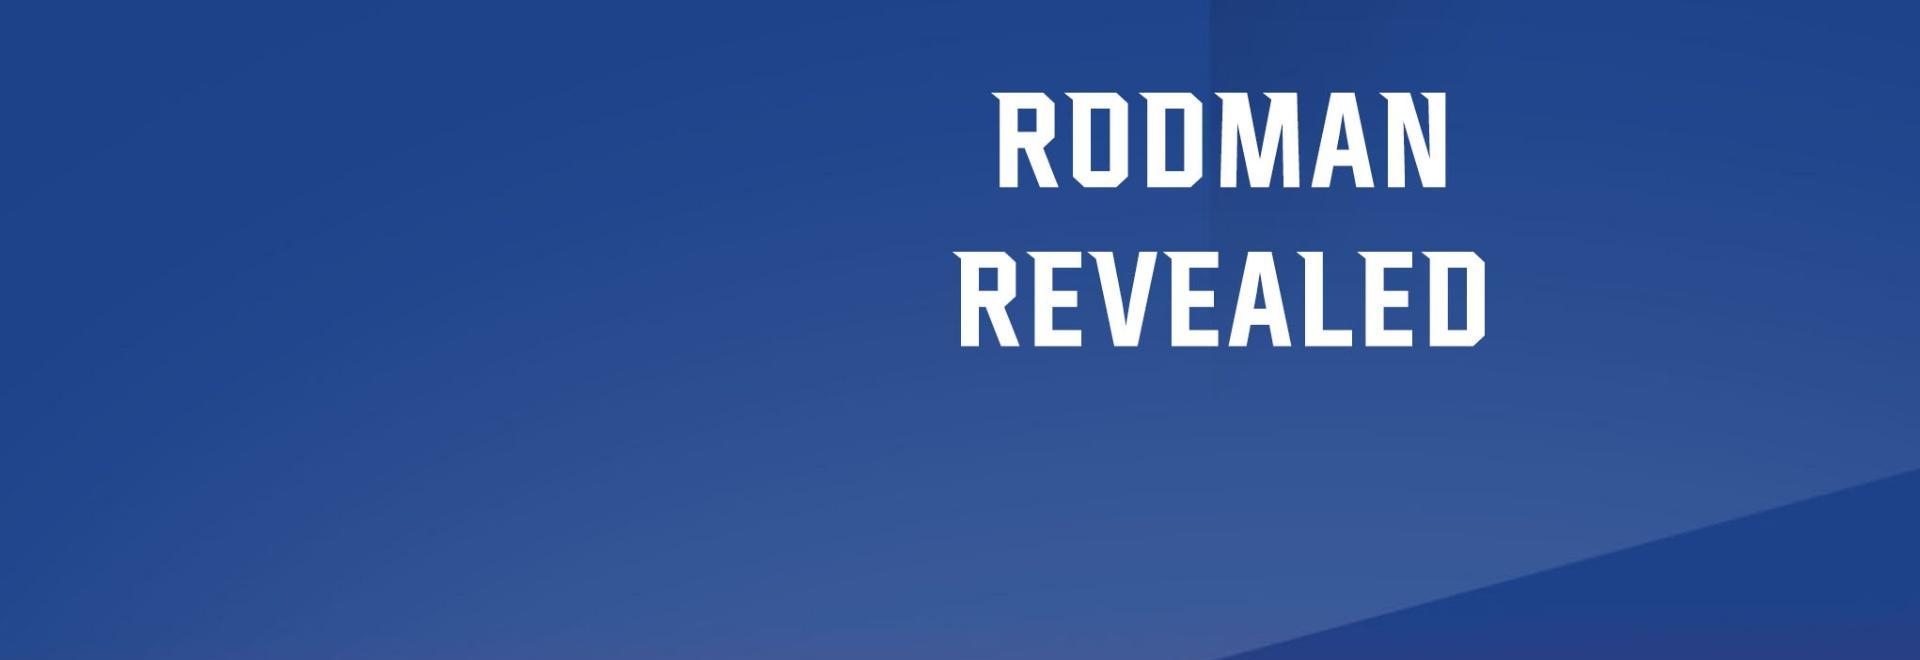 Rodman Revealed